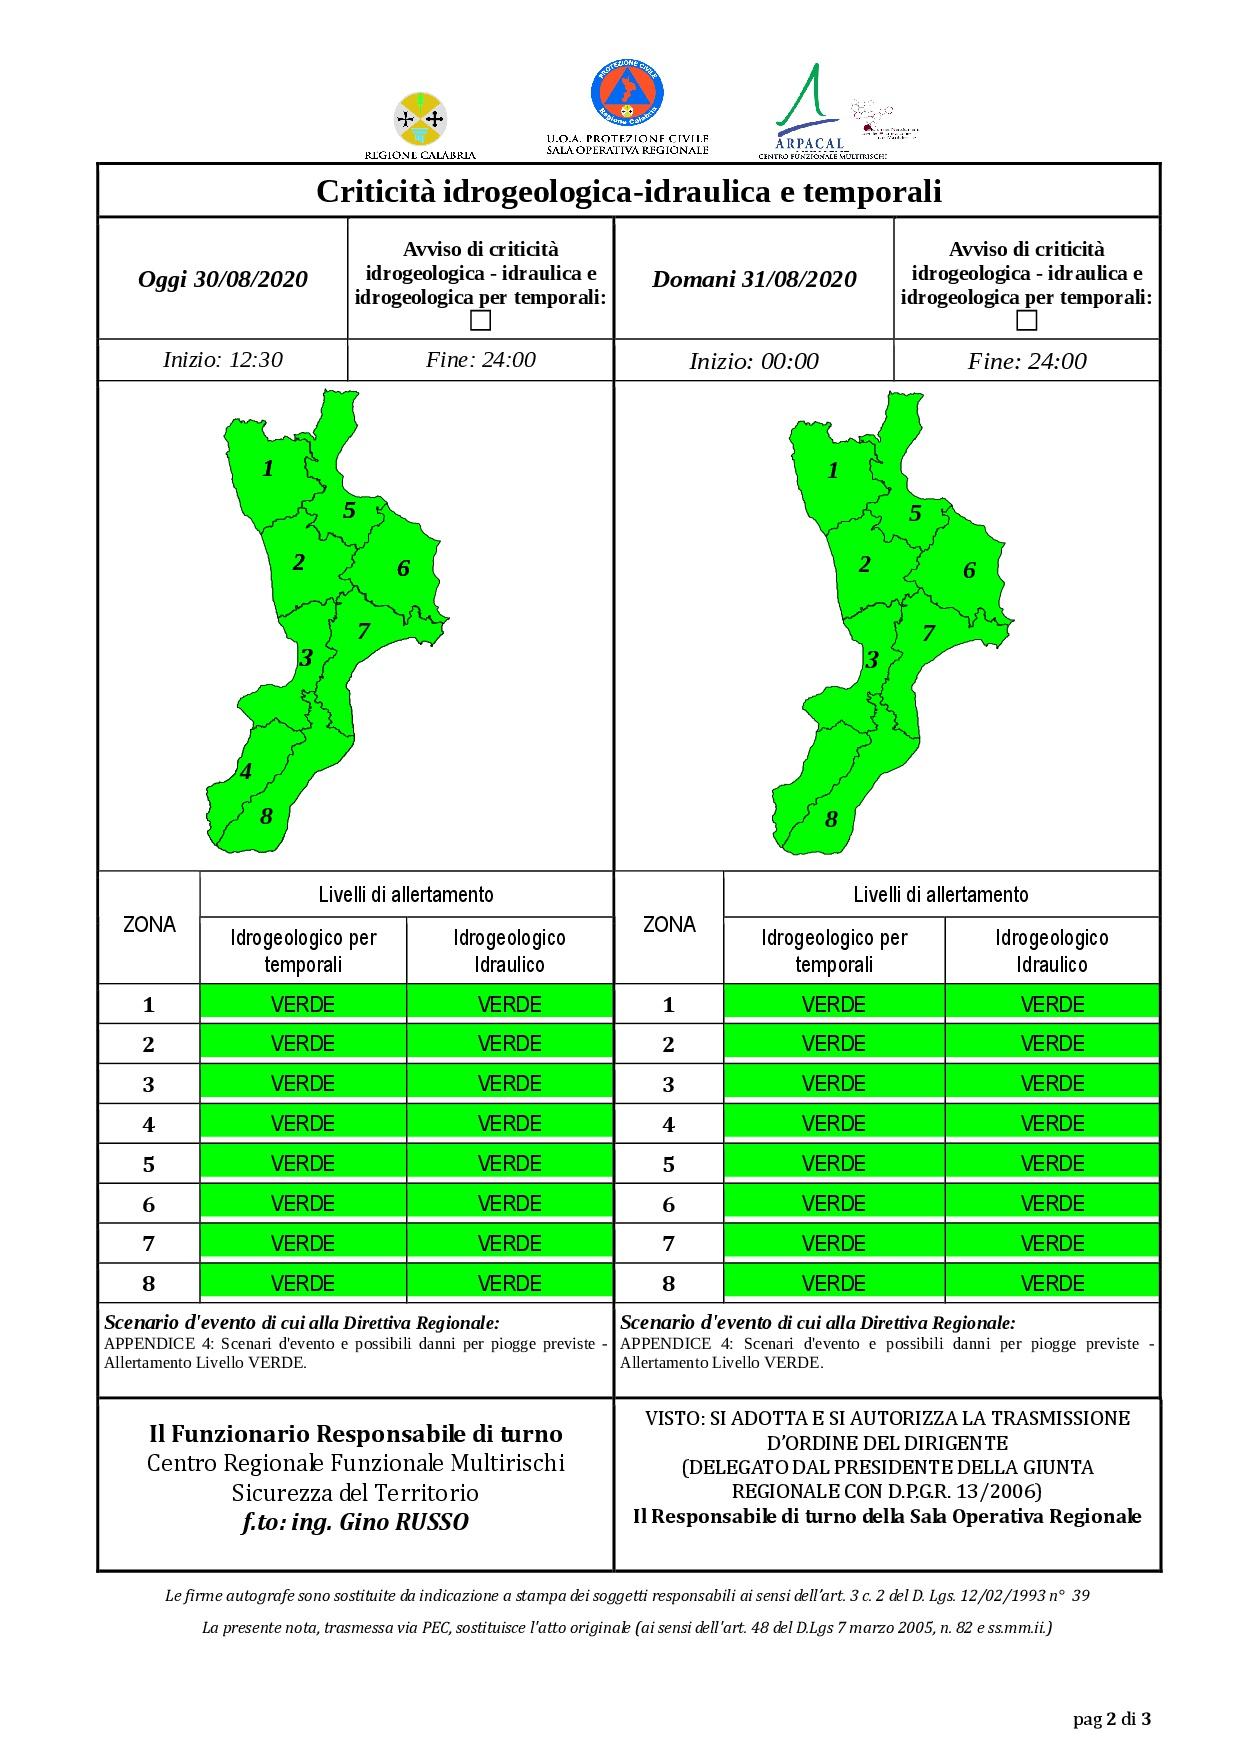 Criticità idrogeologica-idraulica e temporali in Calabria 30-08-2020